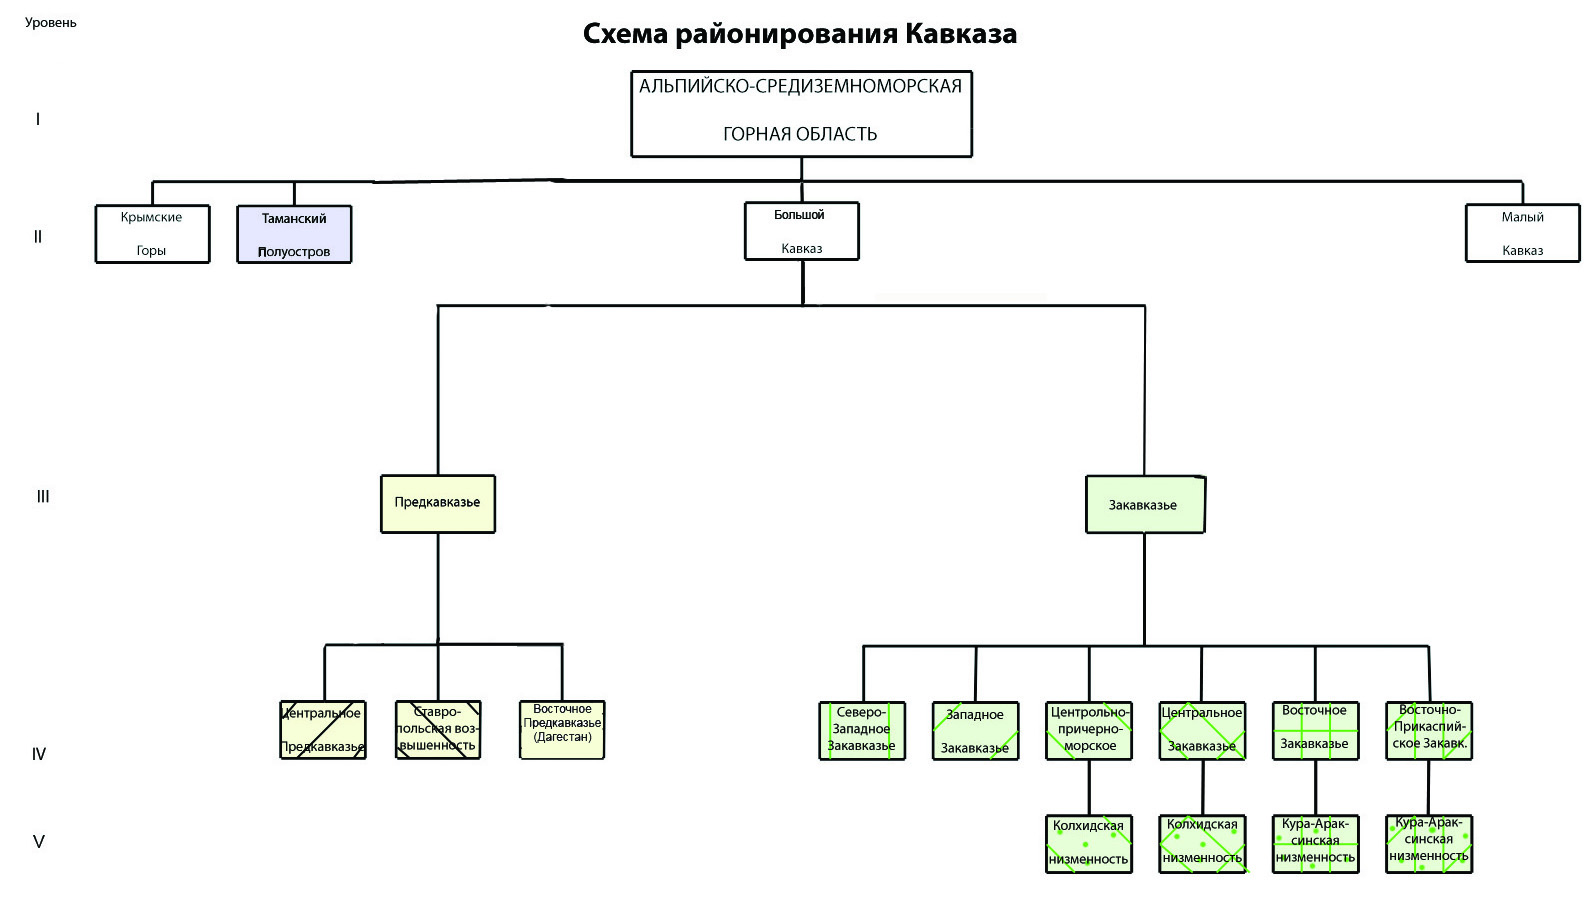 http://forum.plantarium.ru/misc.php?action=pun_attachment&item=10020&download=0